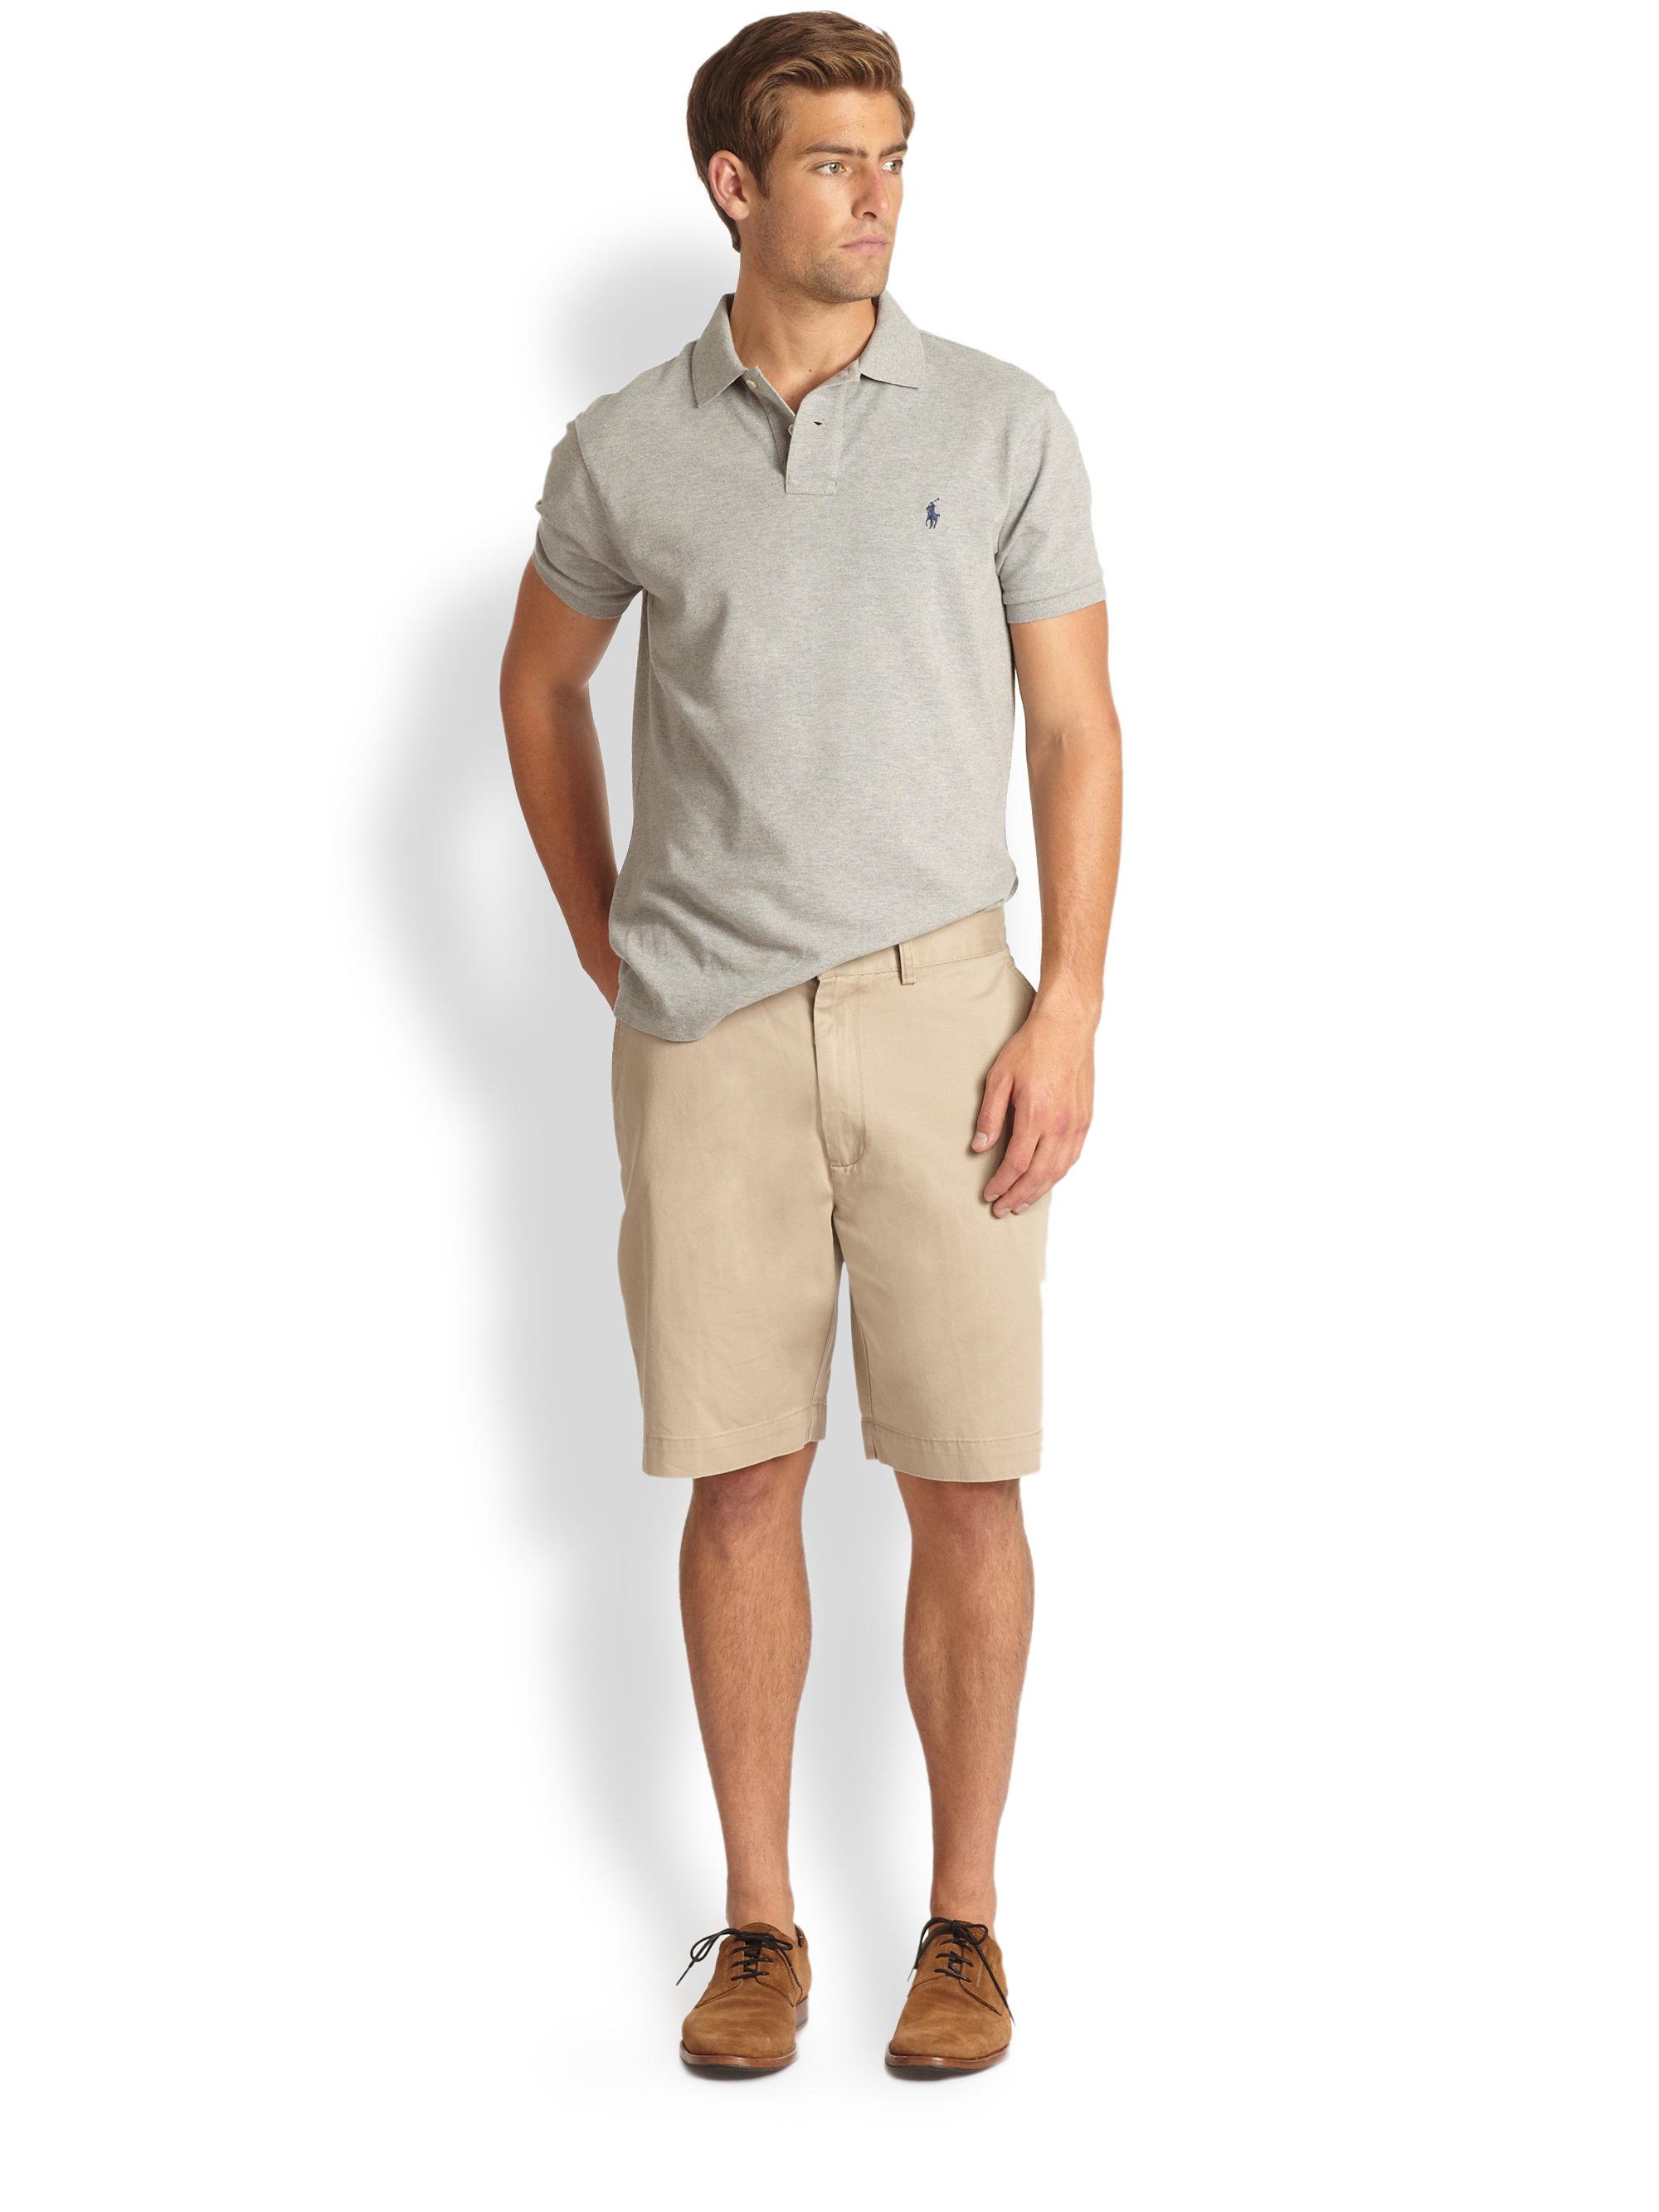 Polo ralph lauren Prospect Shorts in Natural for Men | Lyst